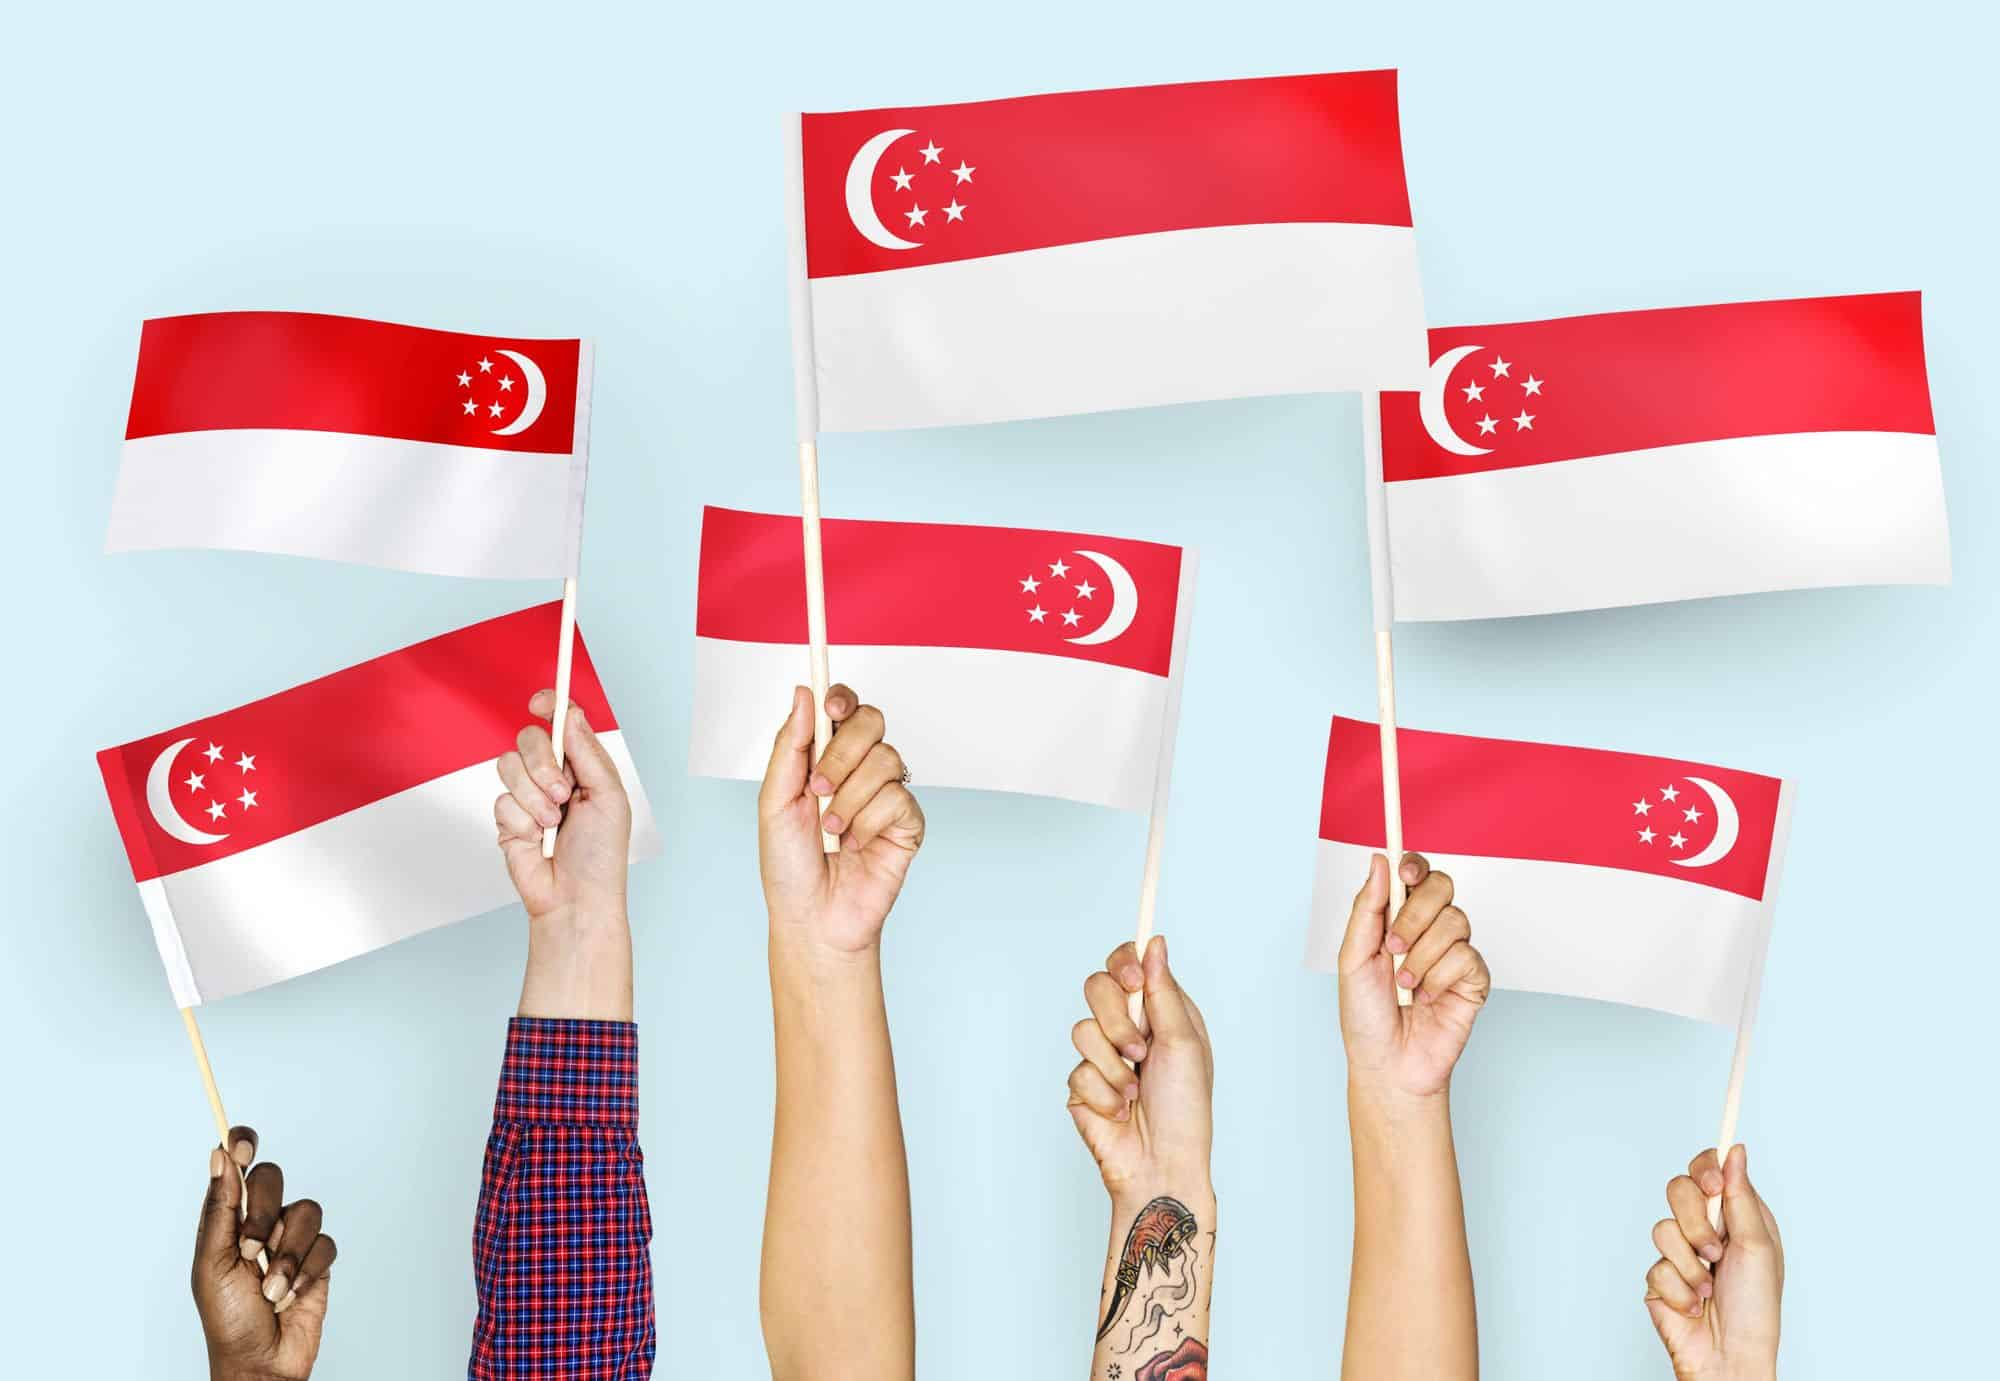 Understanding home bias amongst Singaporean investors